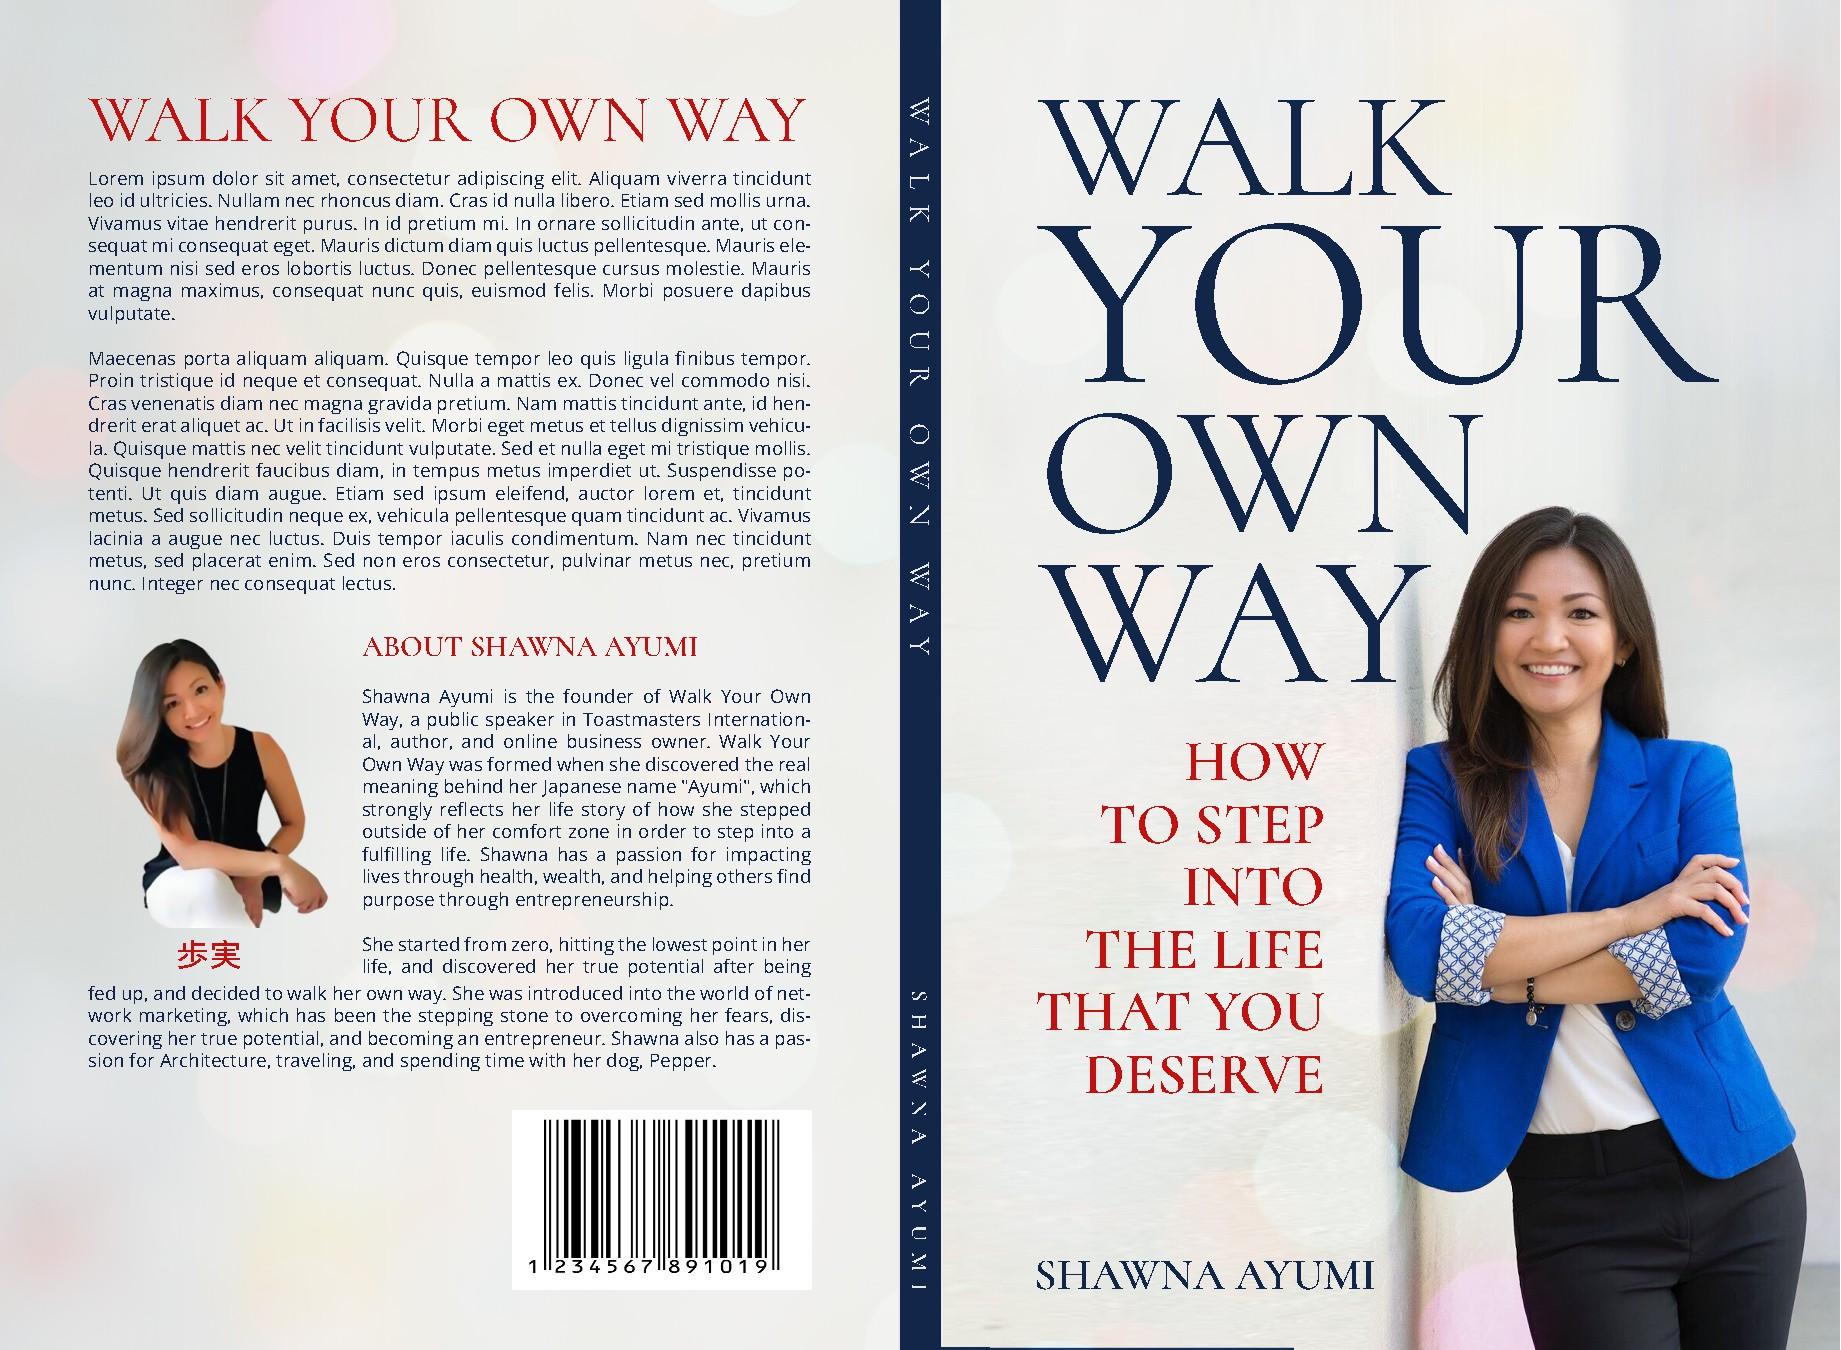 Strong Woman Entrepreneur - WALK YOUR OWN WAY